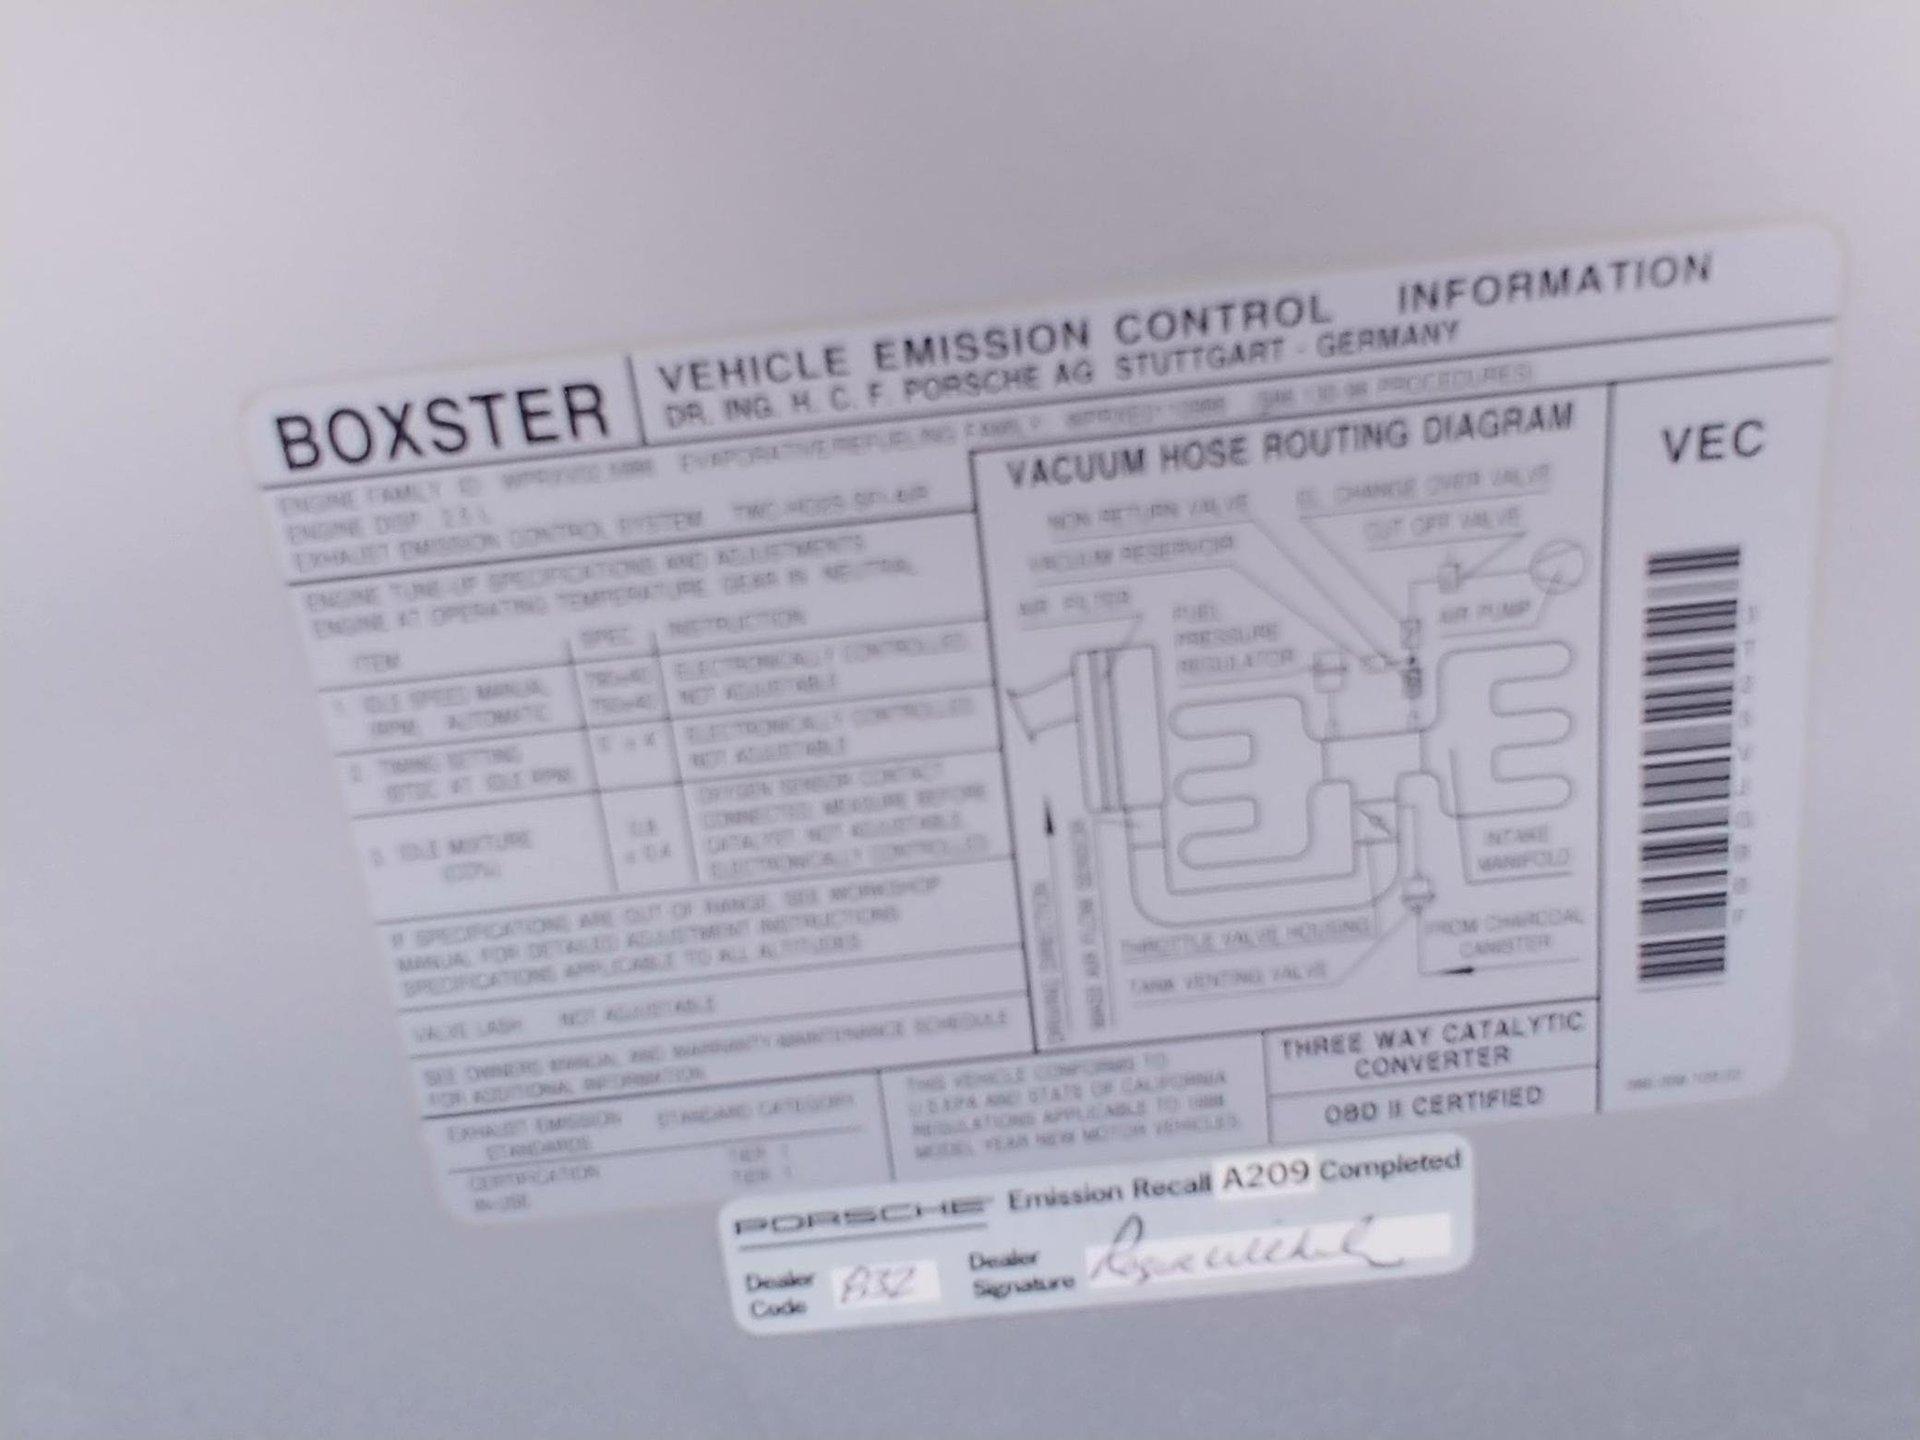 1998 Porsche Boxster Clean Carfax Nice For Sale 103966 Mcg Engine Vacuum Diagram